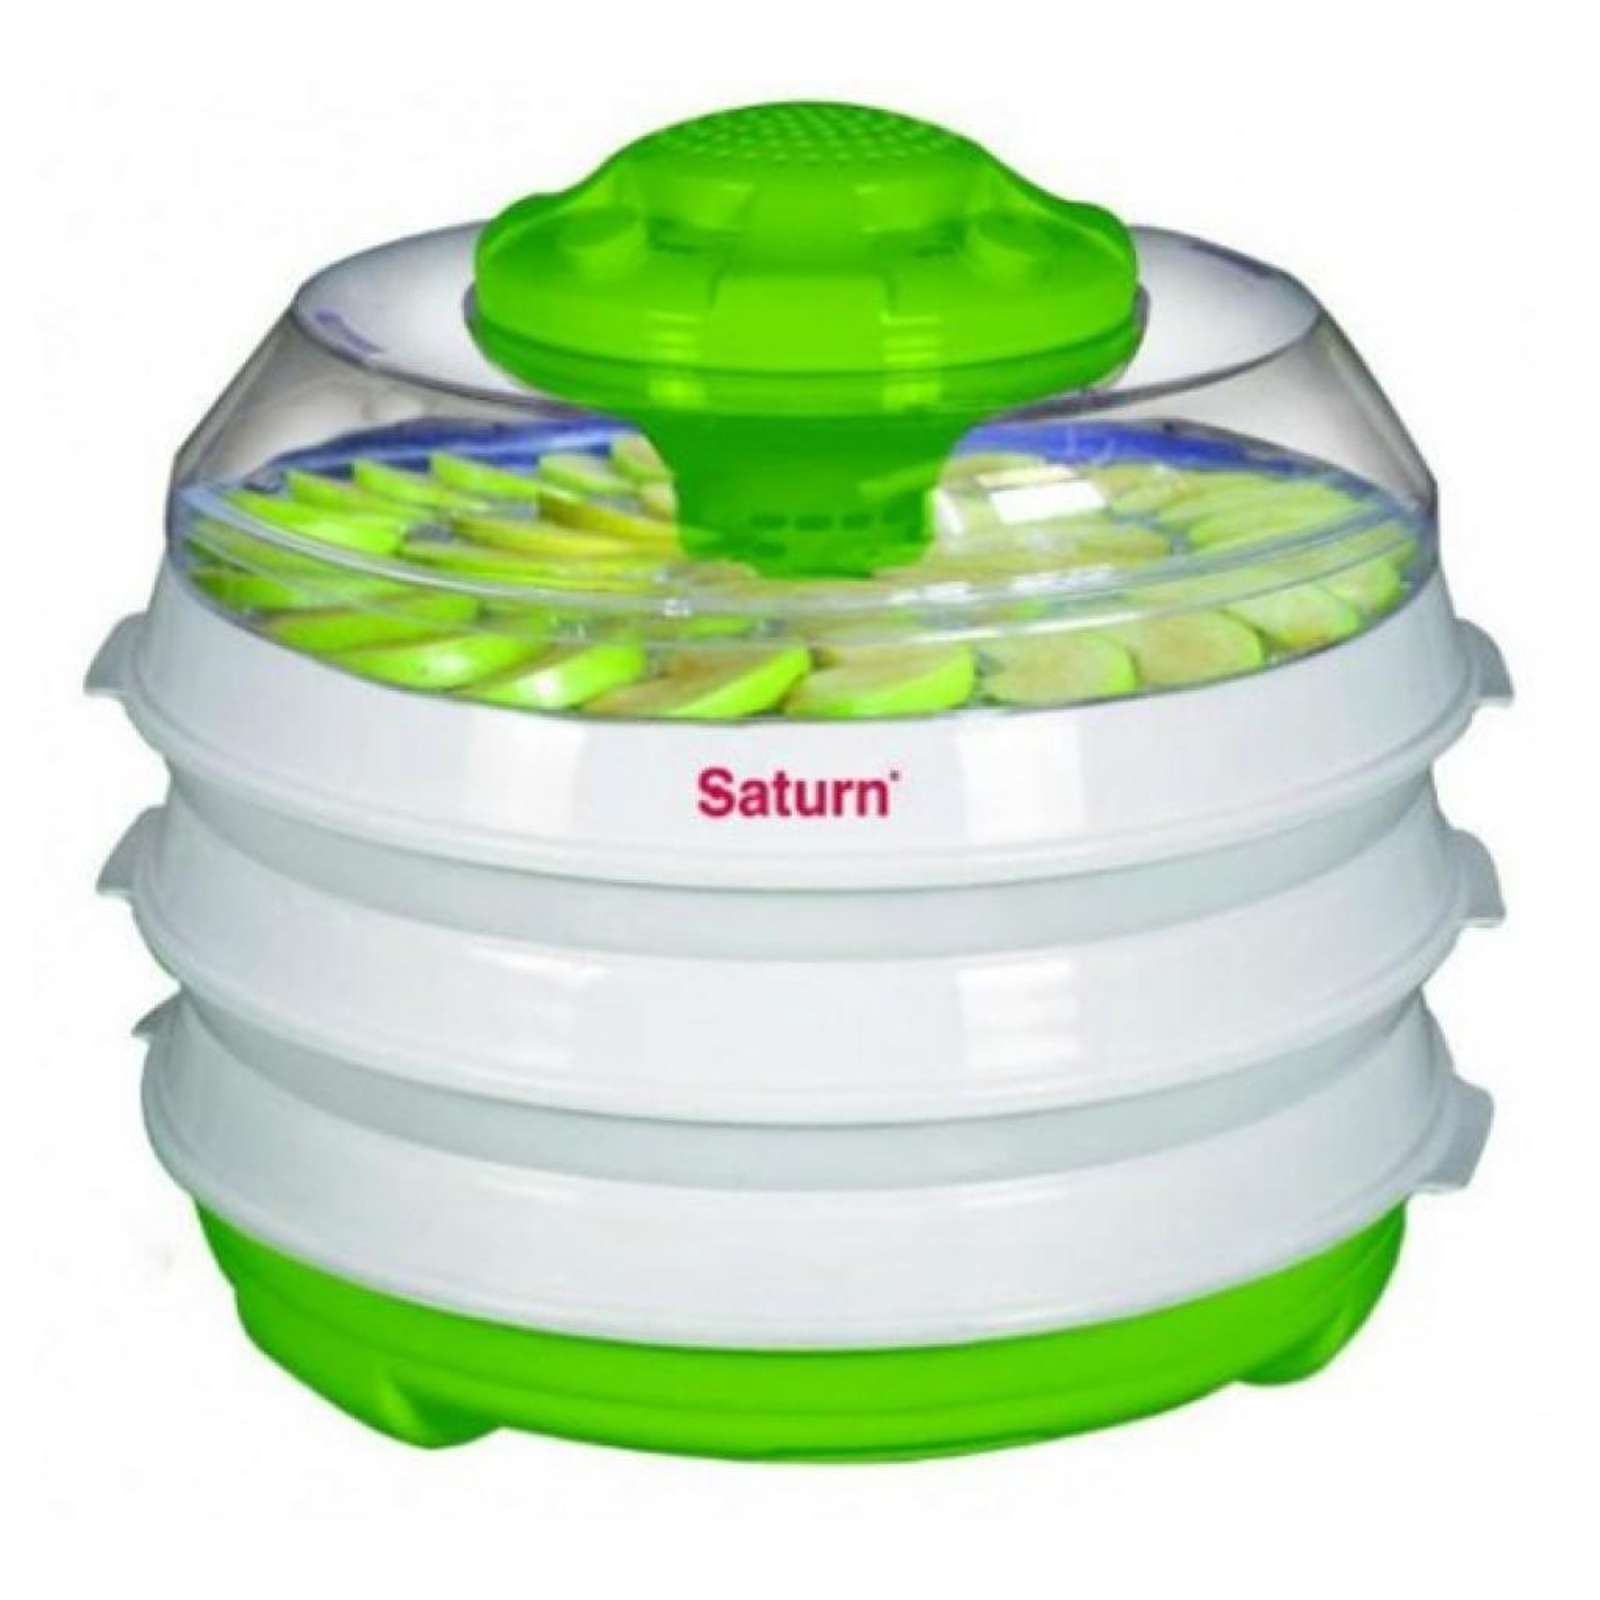 Сушка для овощей и фруктов SATURN ST-FP0112 Green-white